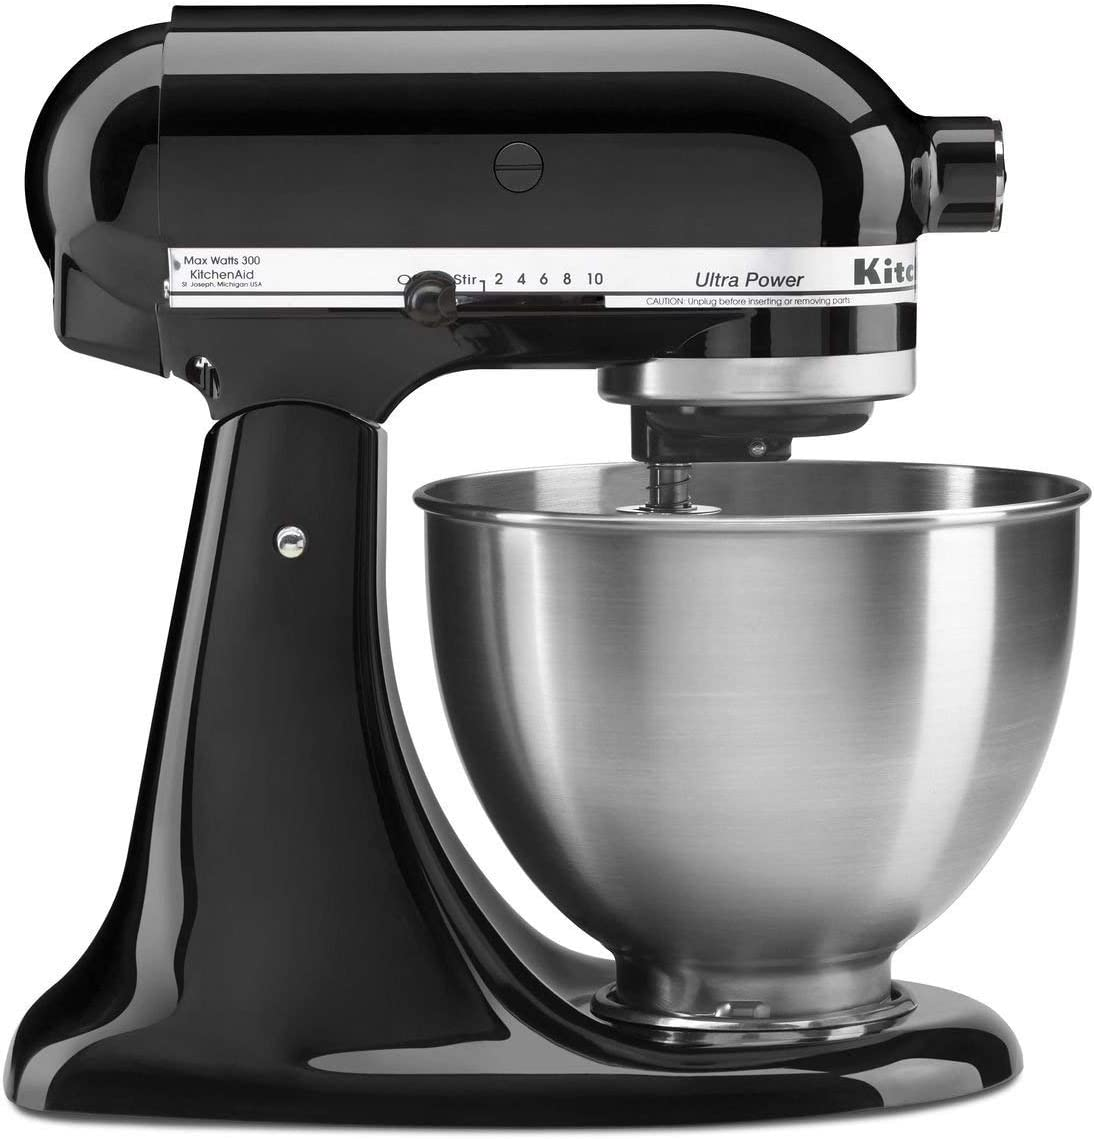 KitchenAid KSM95 4.5-quart Ultra Power Tilt-head Stand Mixer – Onyx Black